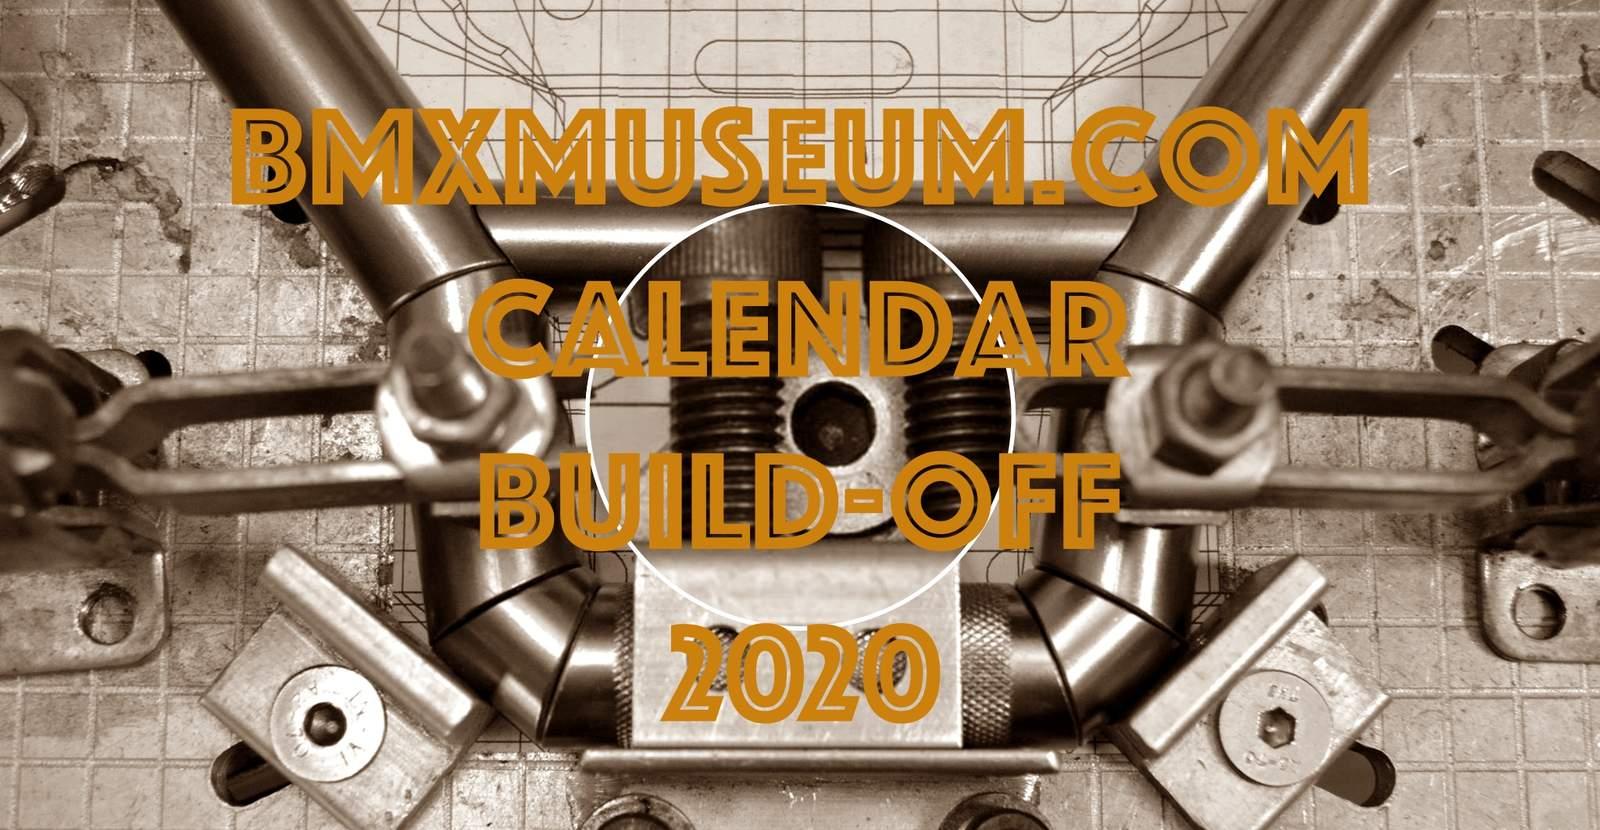 http://uploads.bmxmuseum.com/user-images/138491/museum-banner5d4eb894e2.jpg